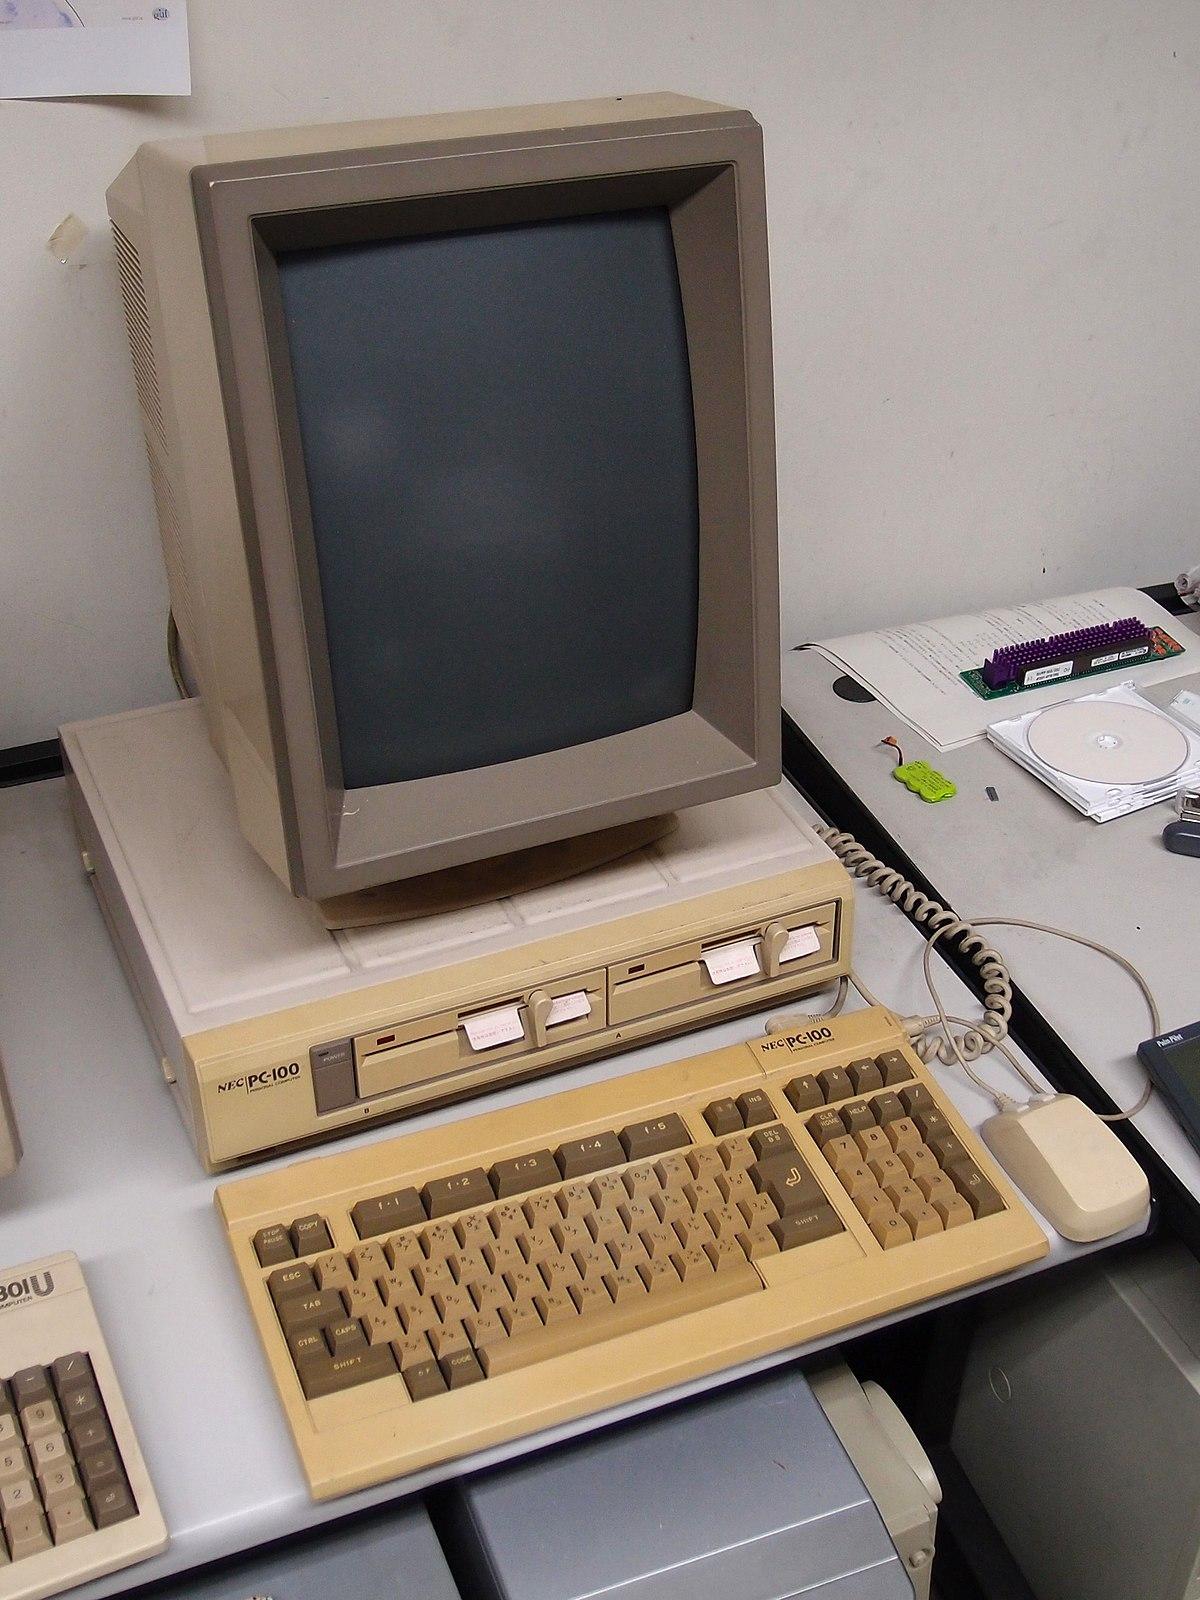 Used Ram 2500 >> NEC PC-100 - Wikipedia